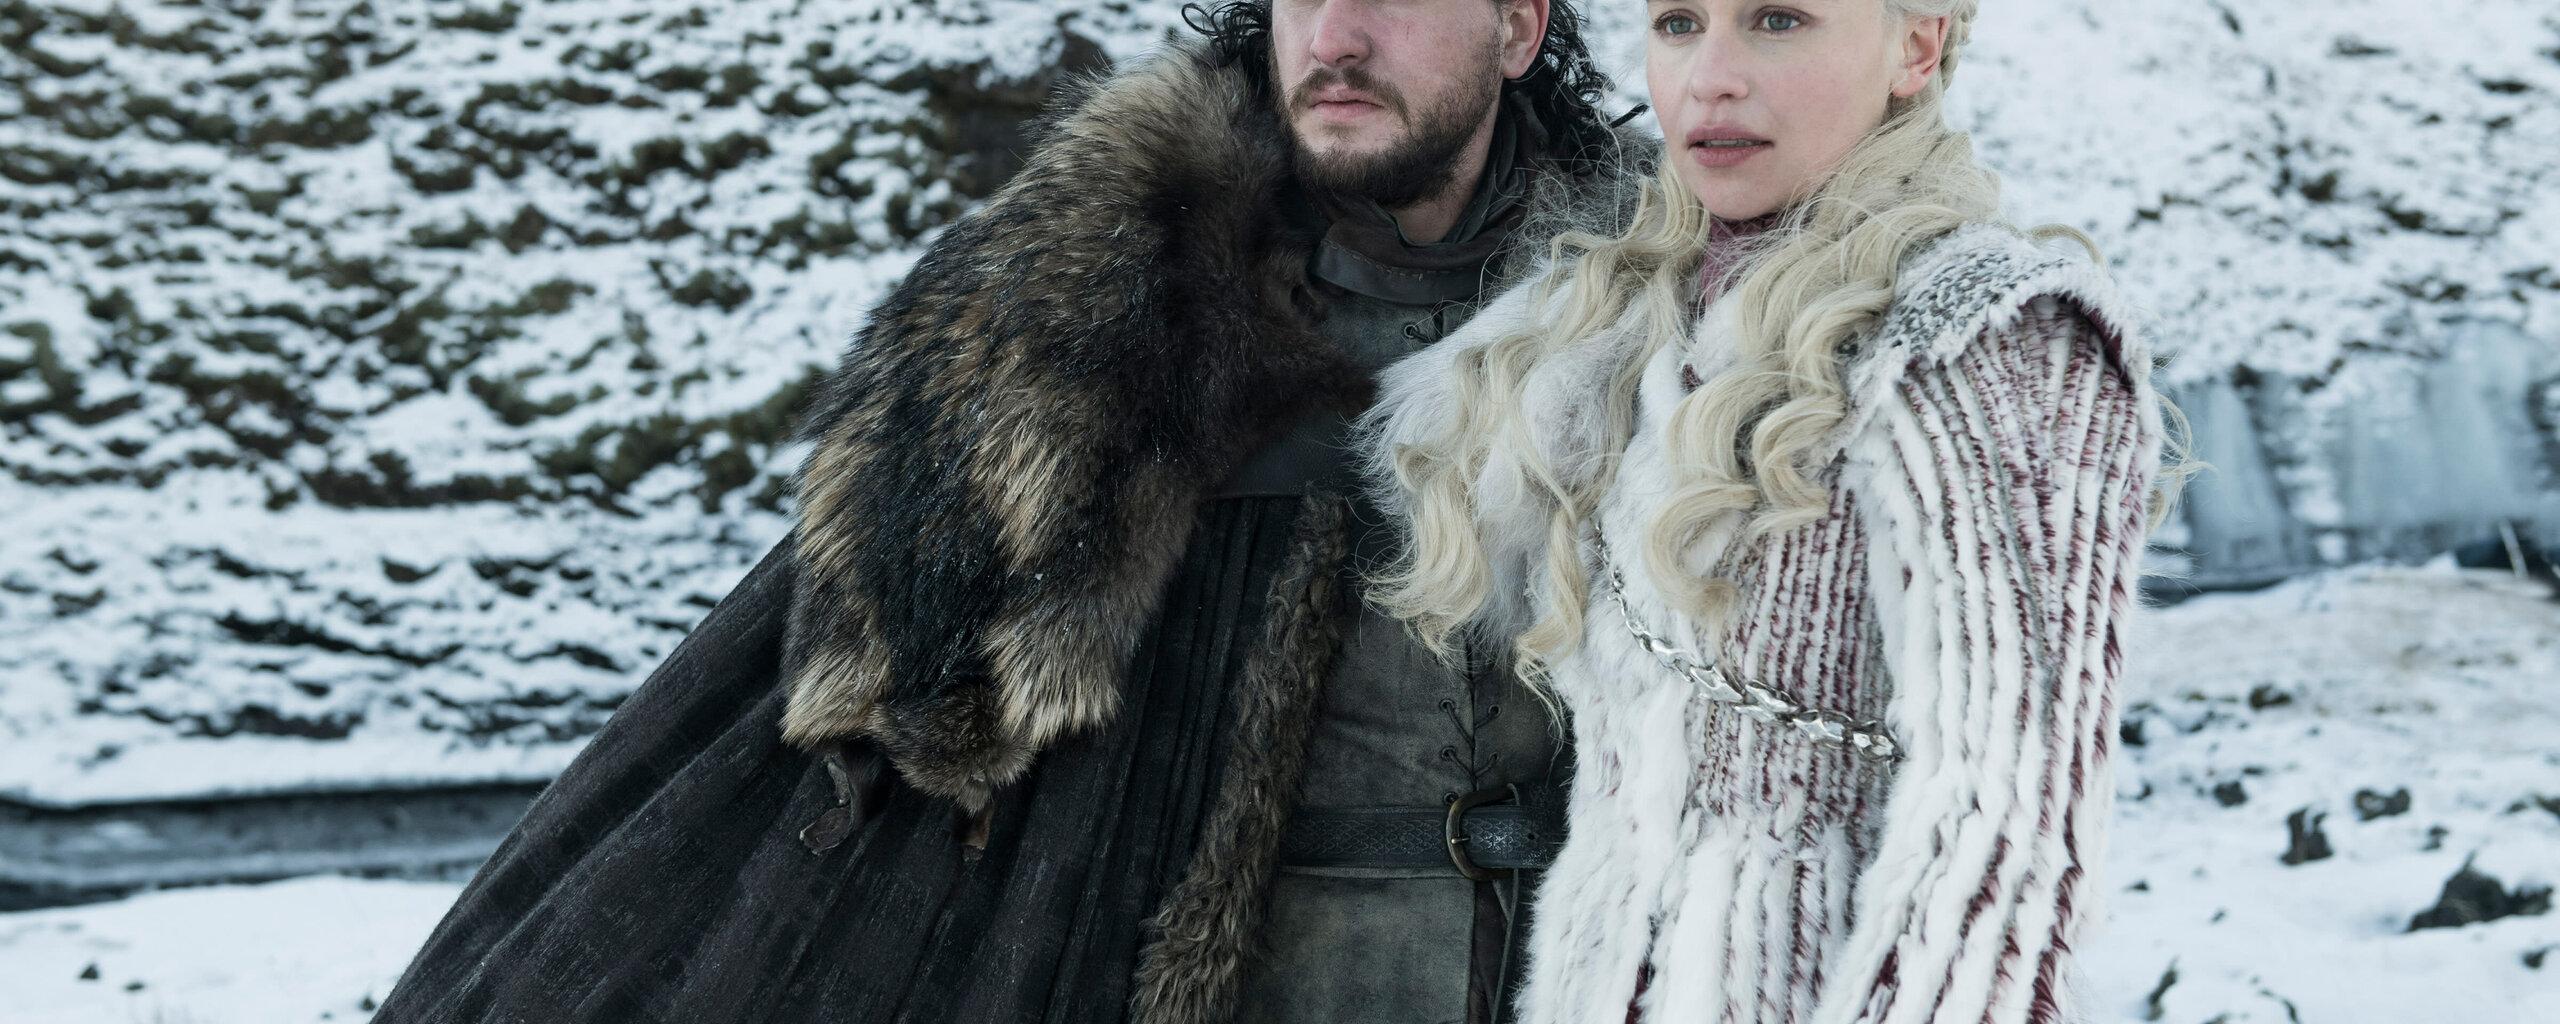 jon-snow-and-daenerys-targaryen-game-of-thrones-season-8-75.jpg